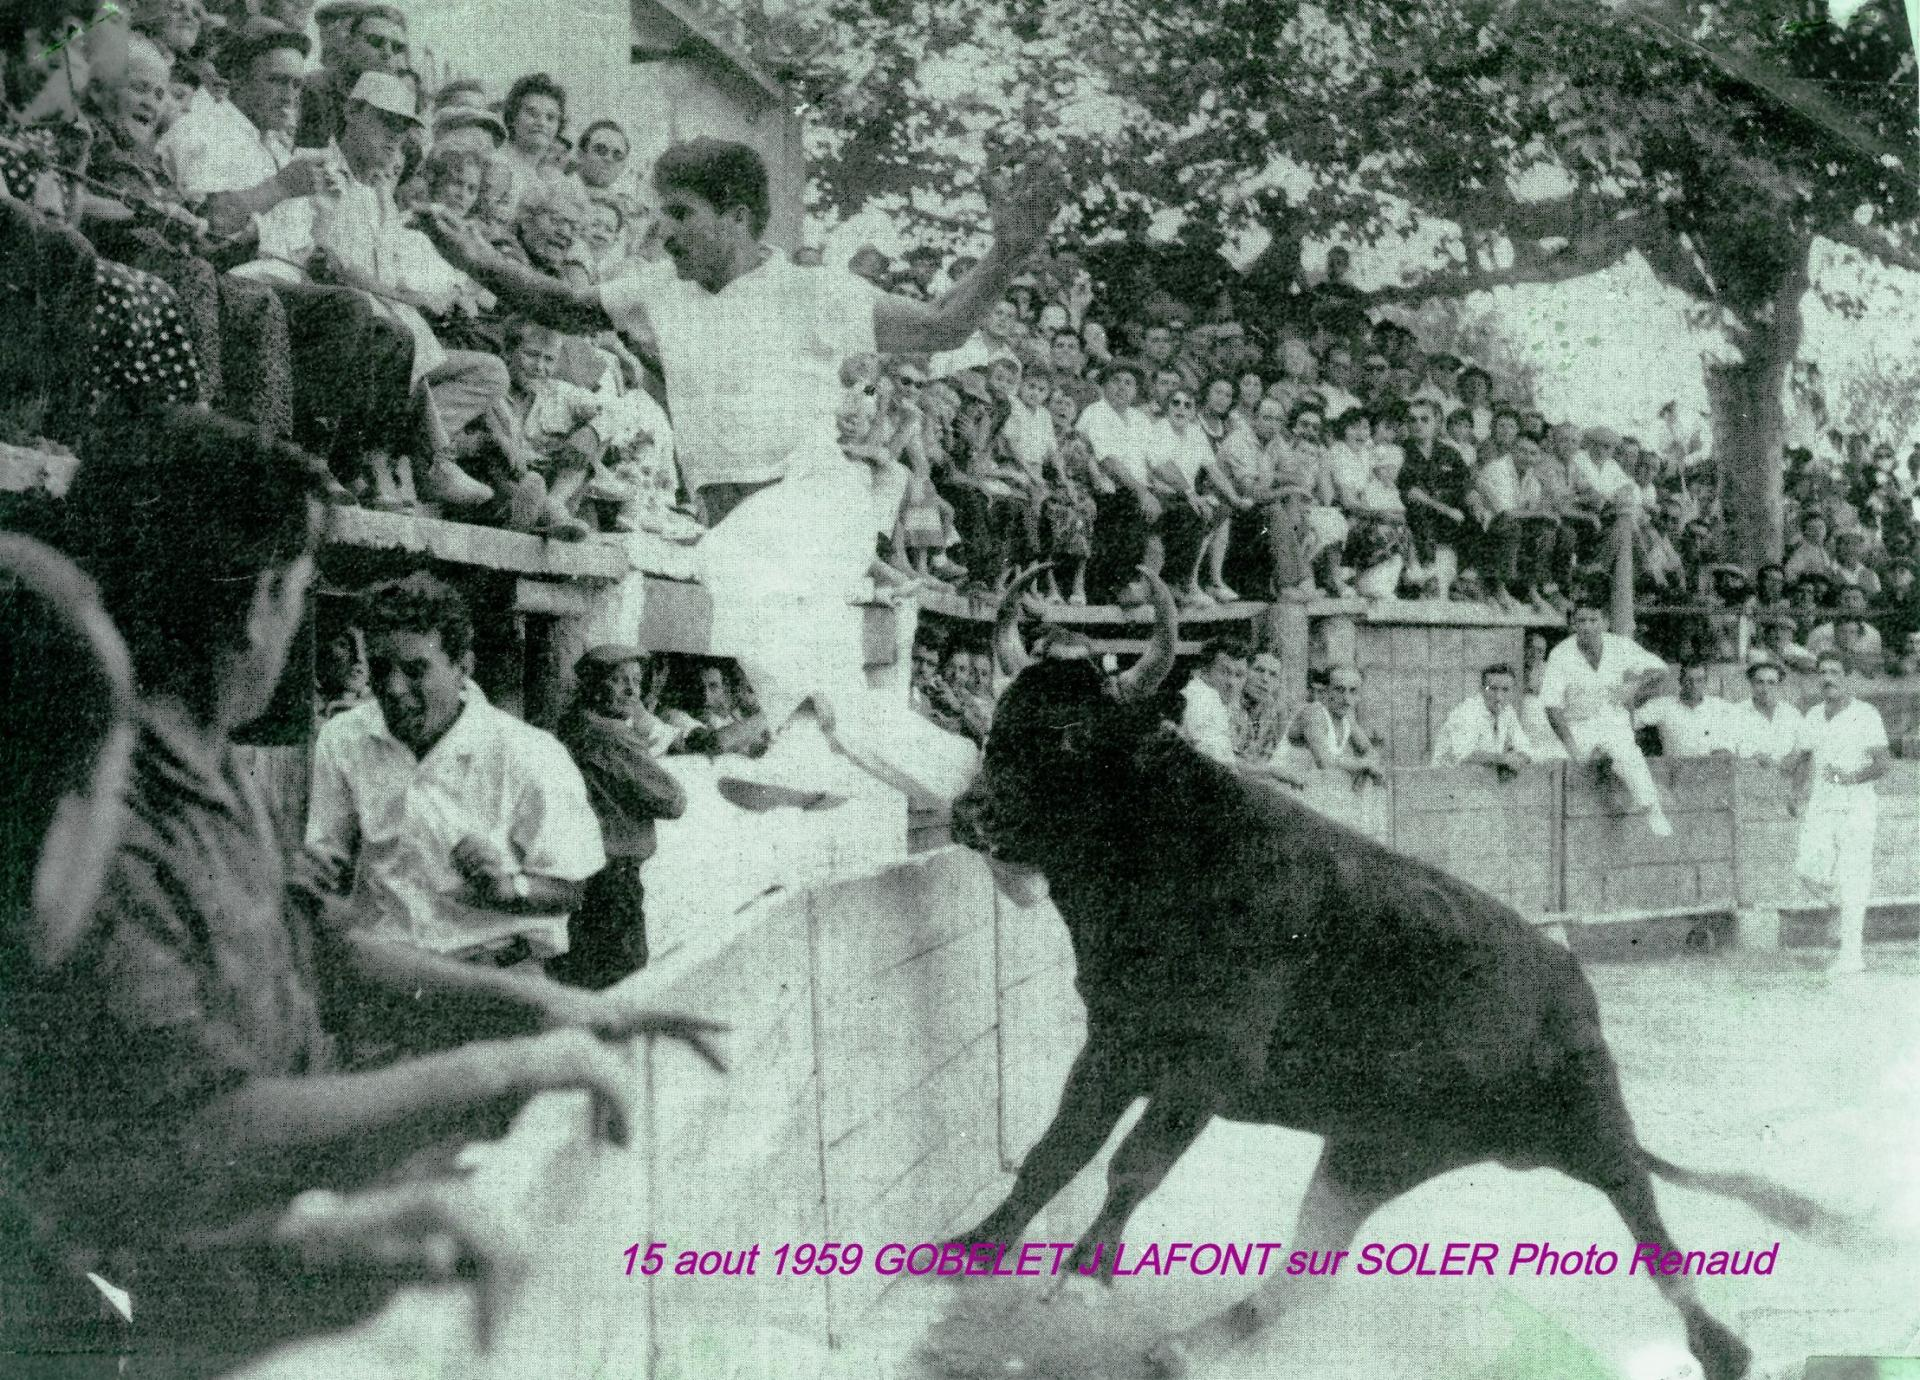 Paluds soler 1959